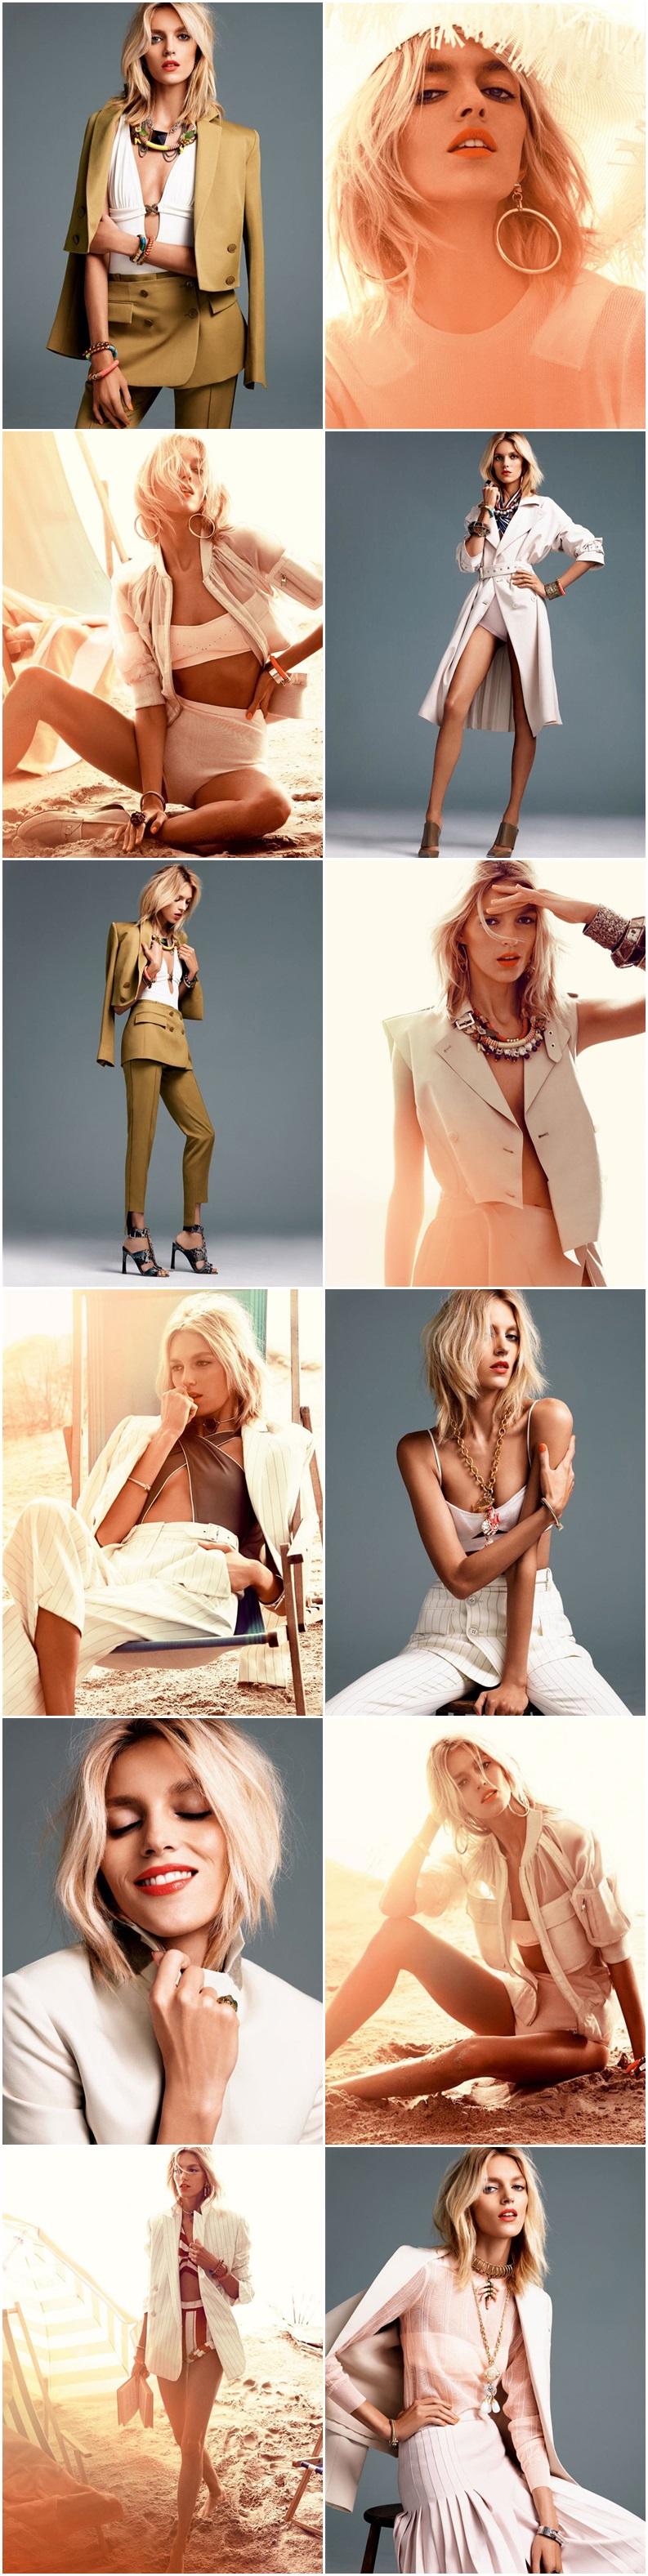 anja-rubik-fashion4addicts.com